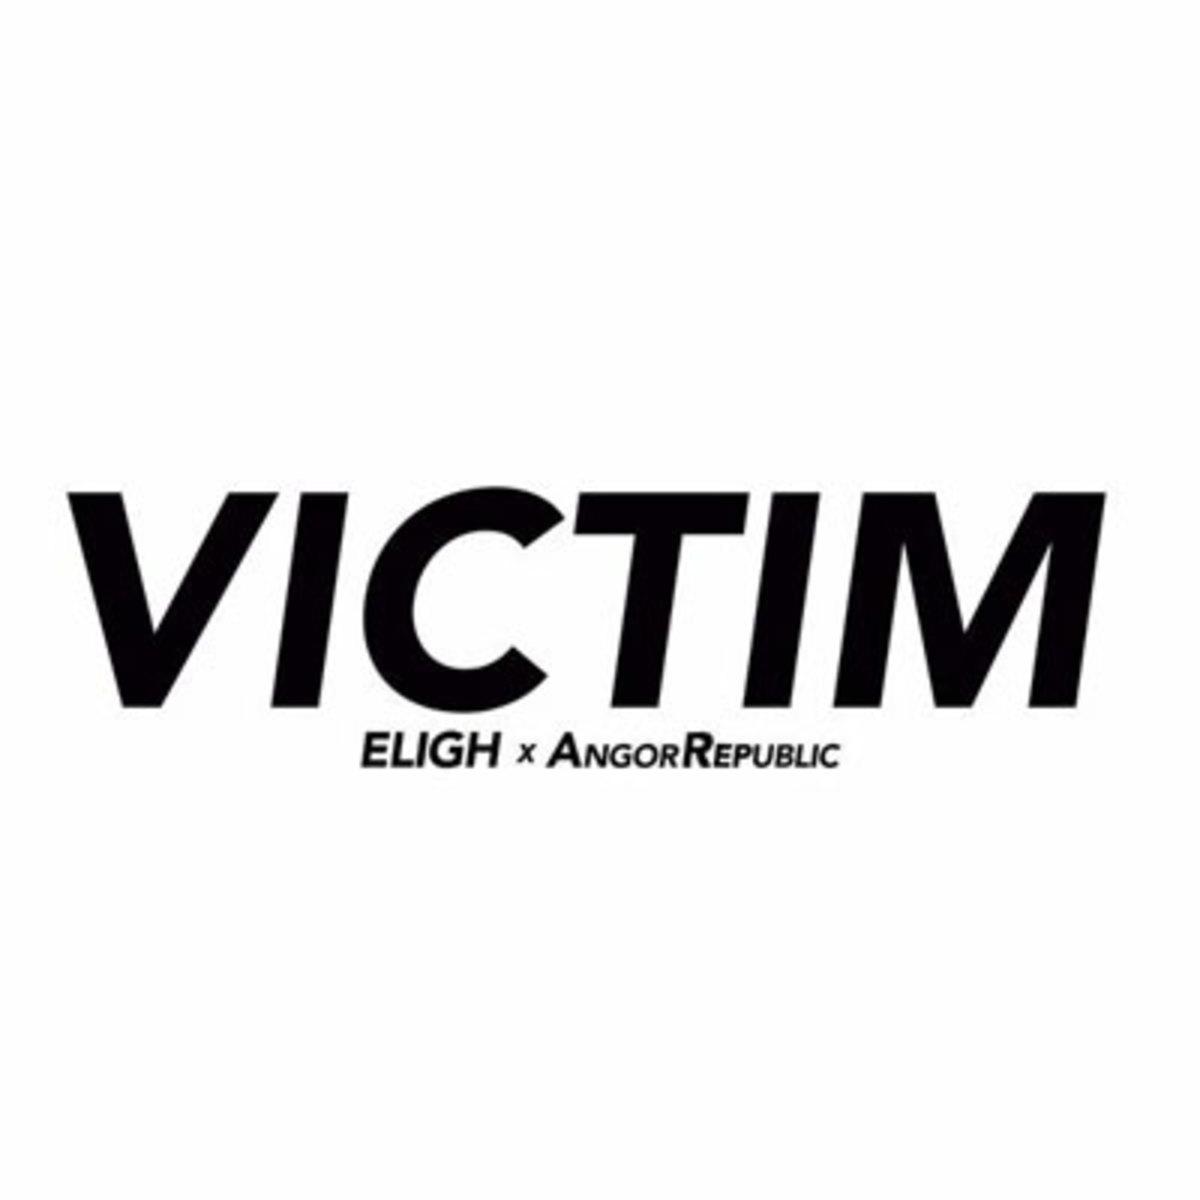 eligh-victim.jpg